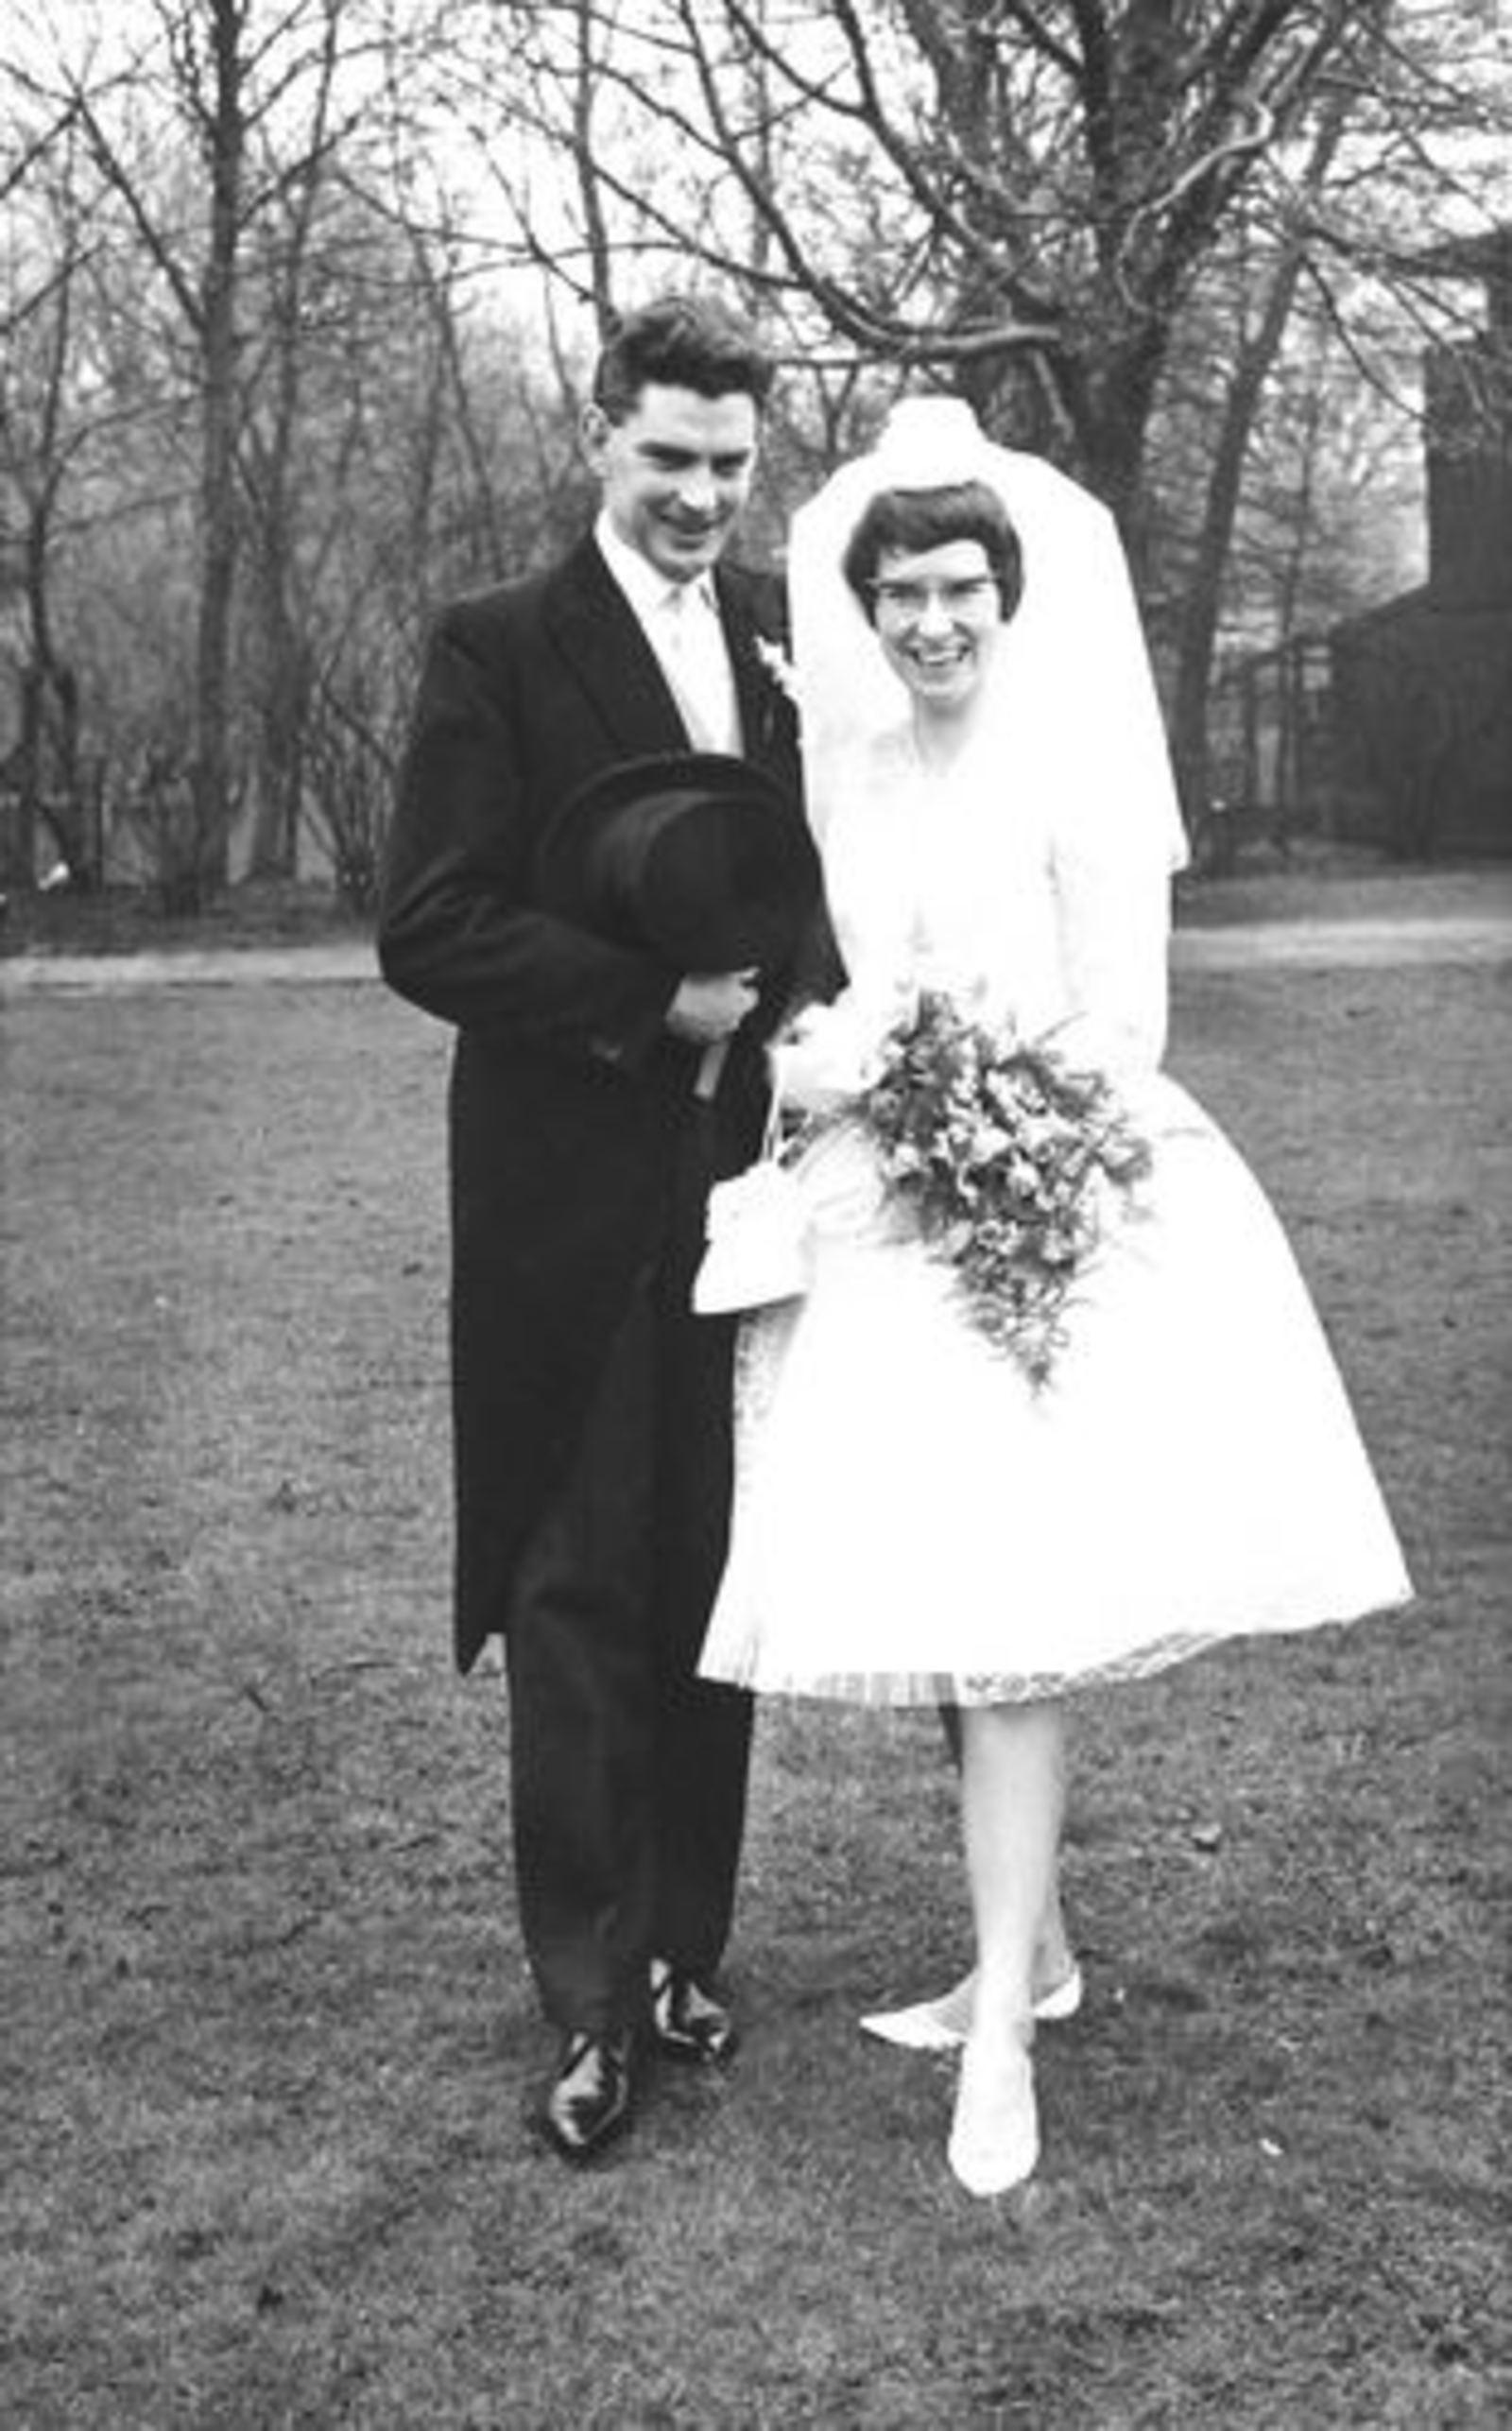 Koeckhoven Theo 1932 1963 trouwt Anne Regtien